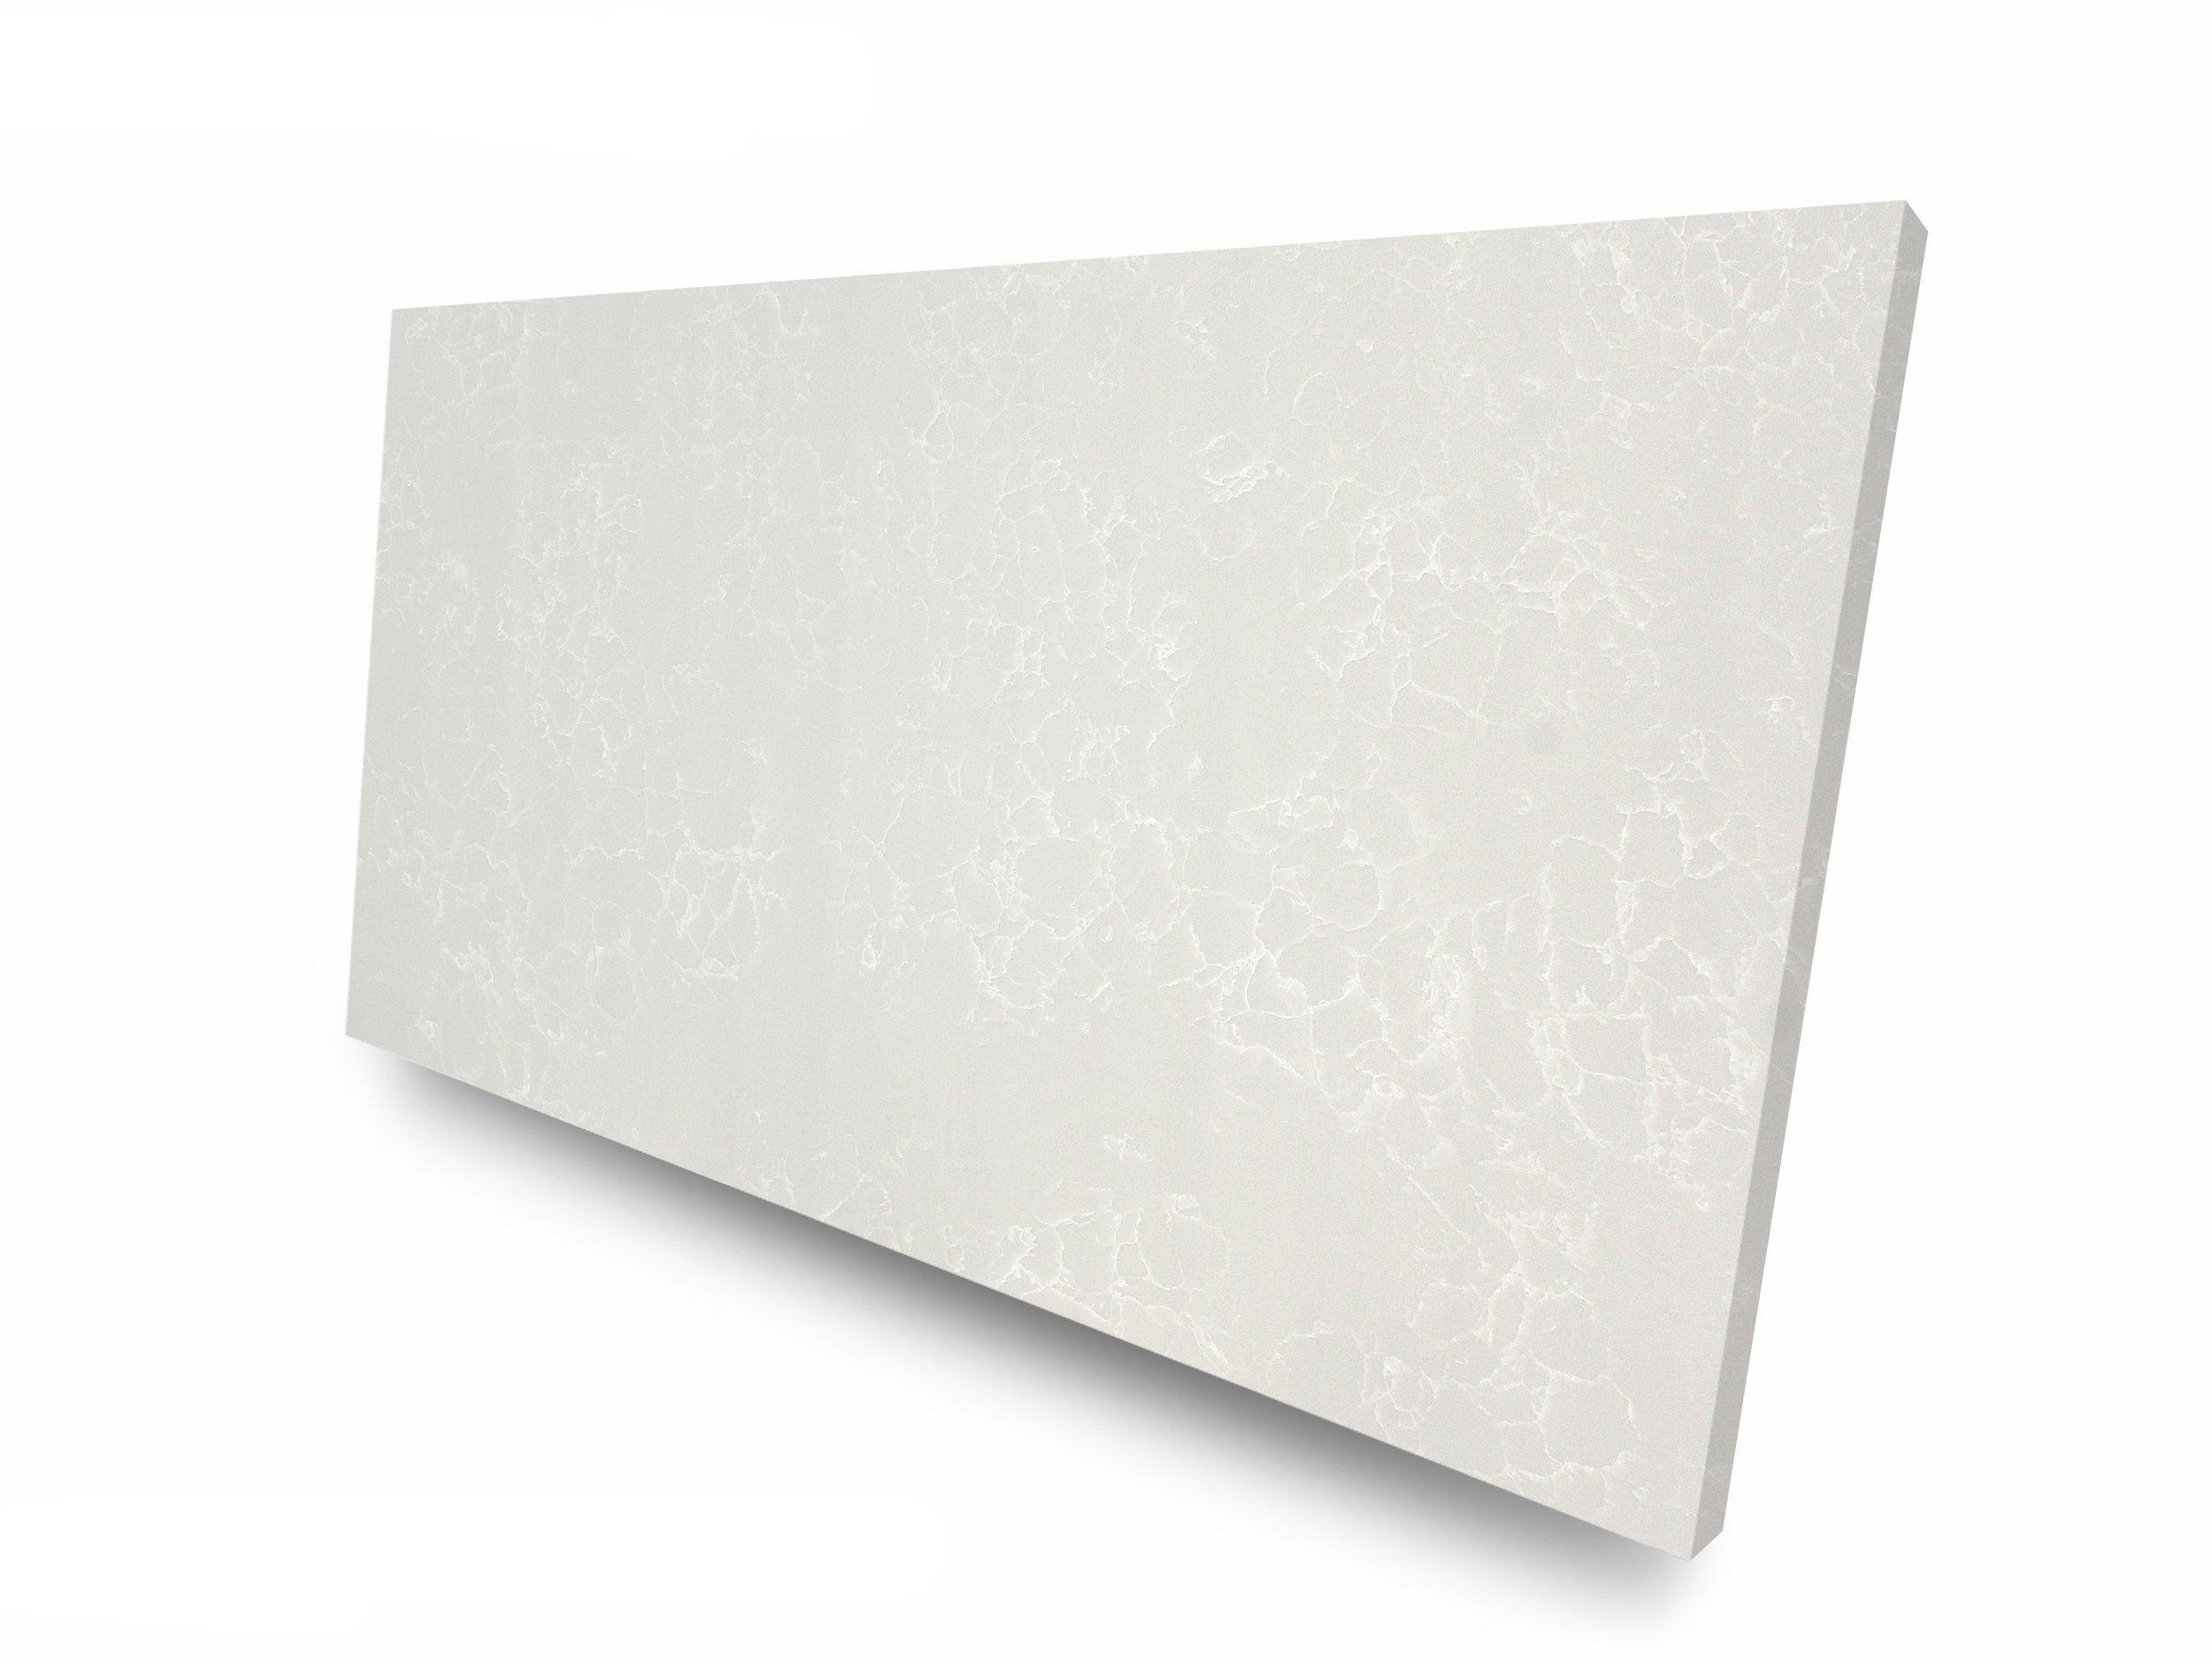 CQ849 Blanc De Blancs Slab